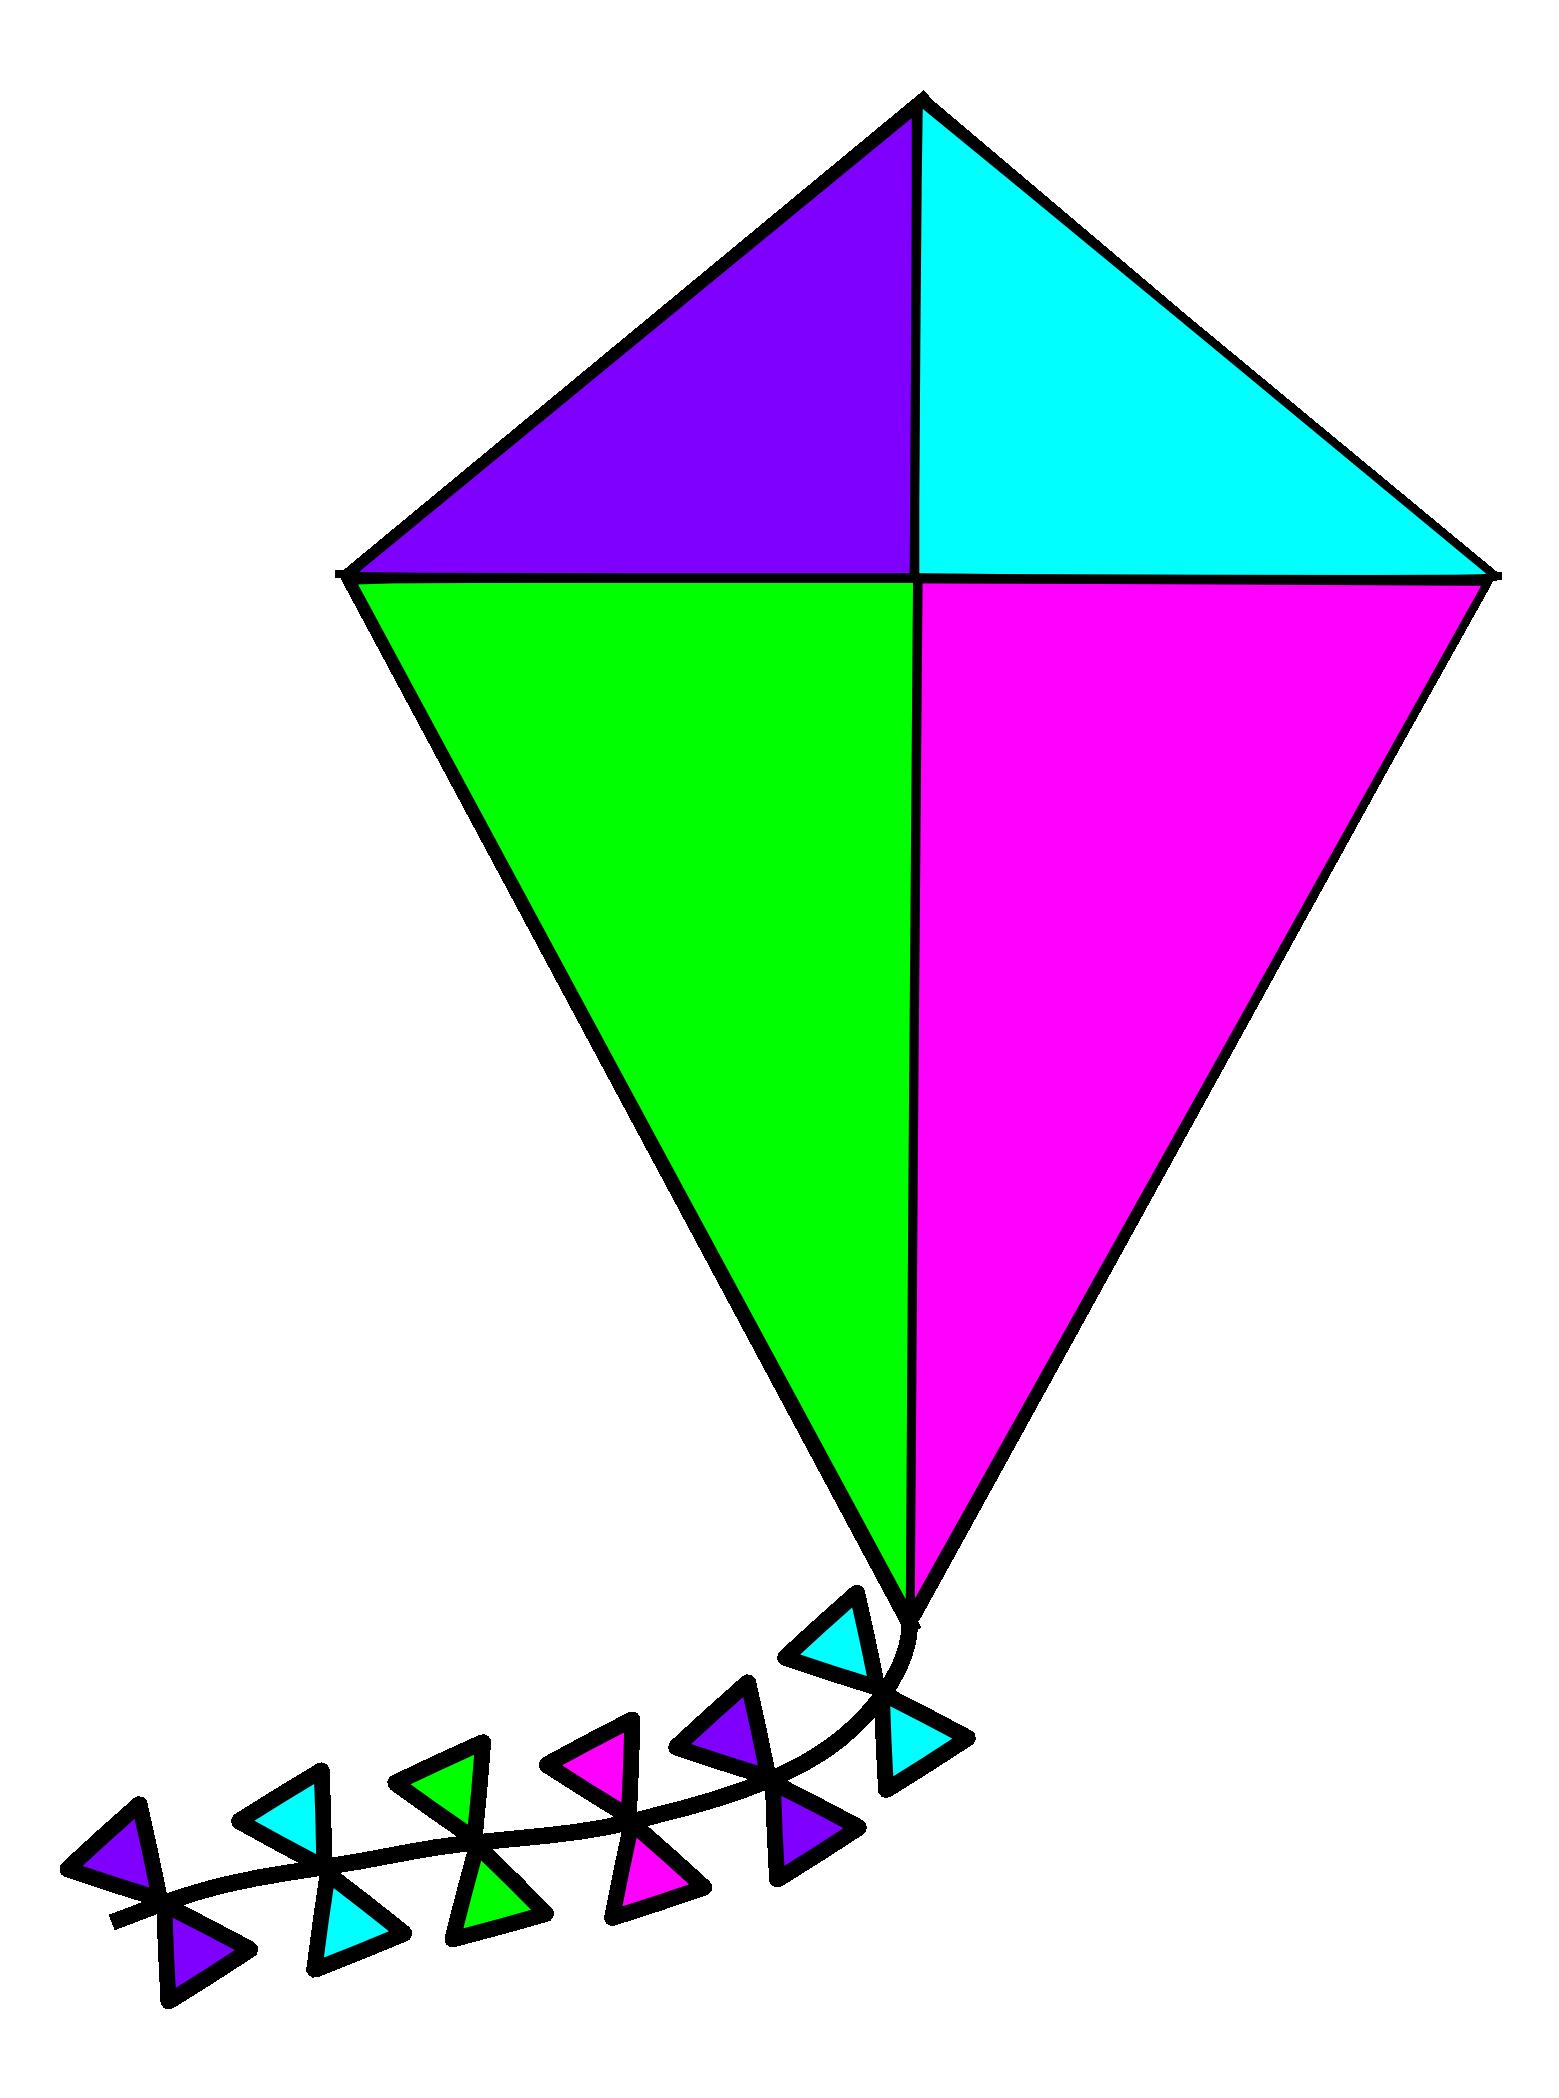 Png transparent image pngpix. Clipart toys kite